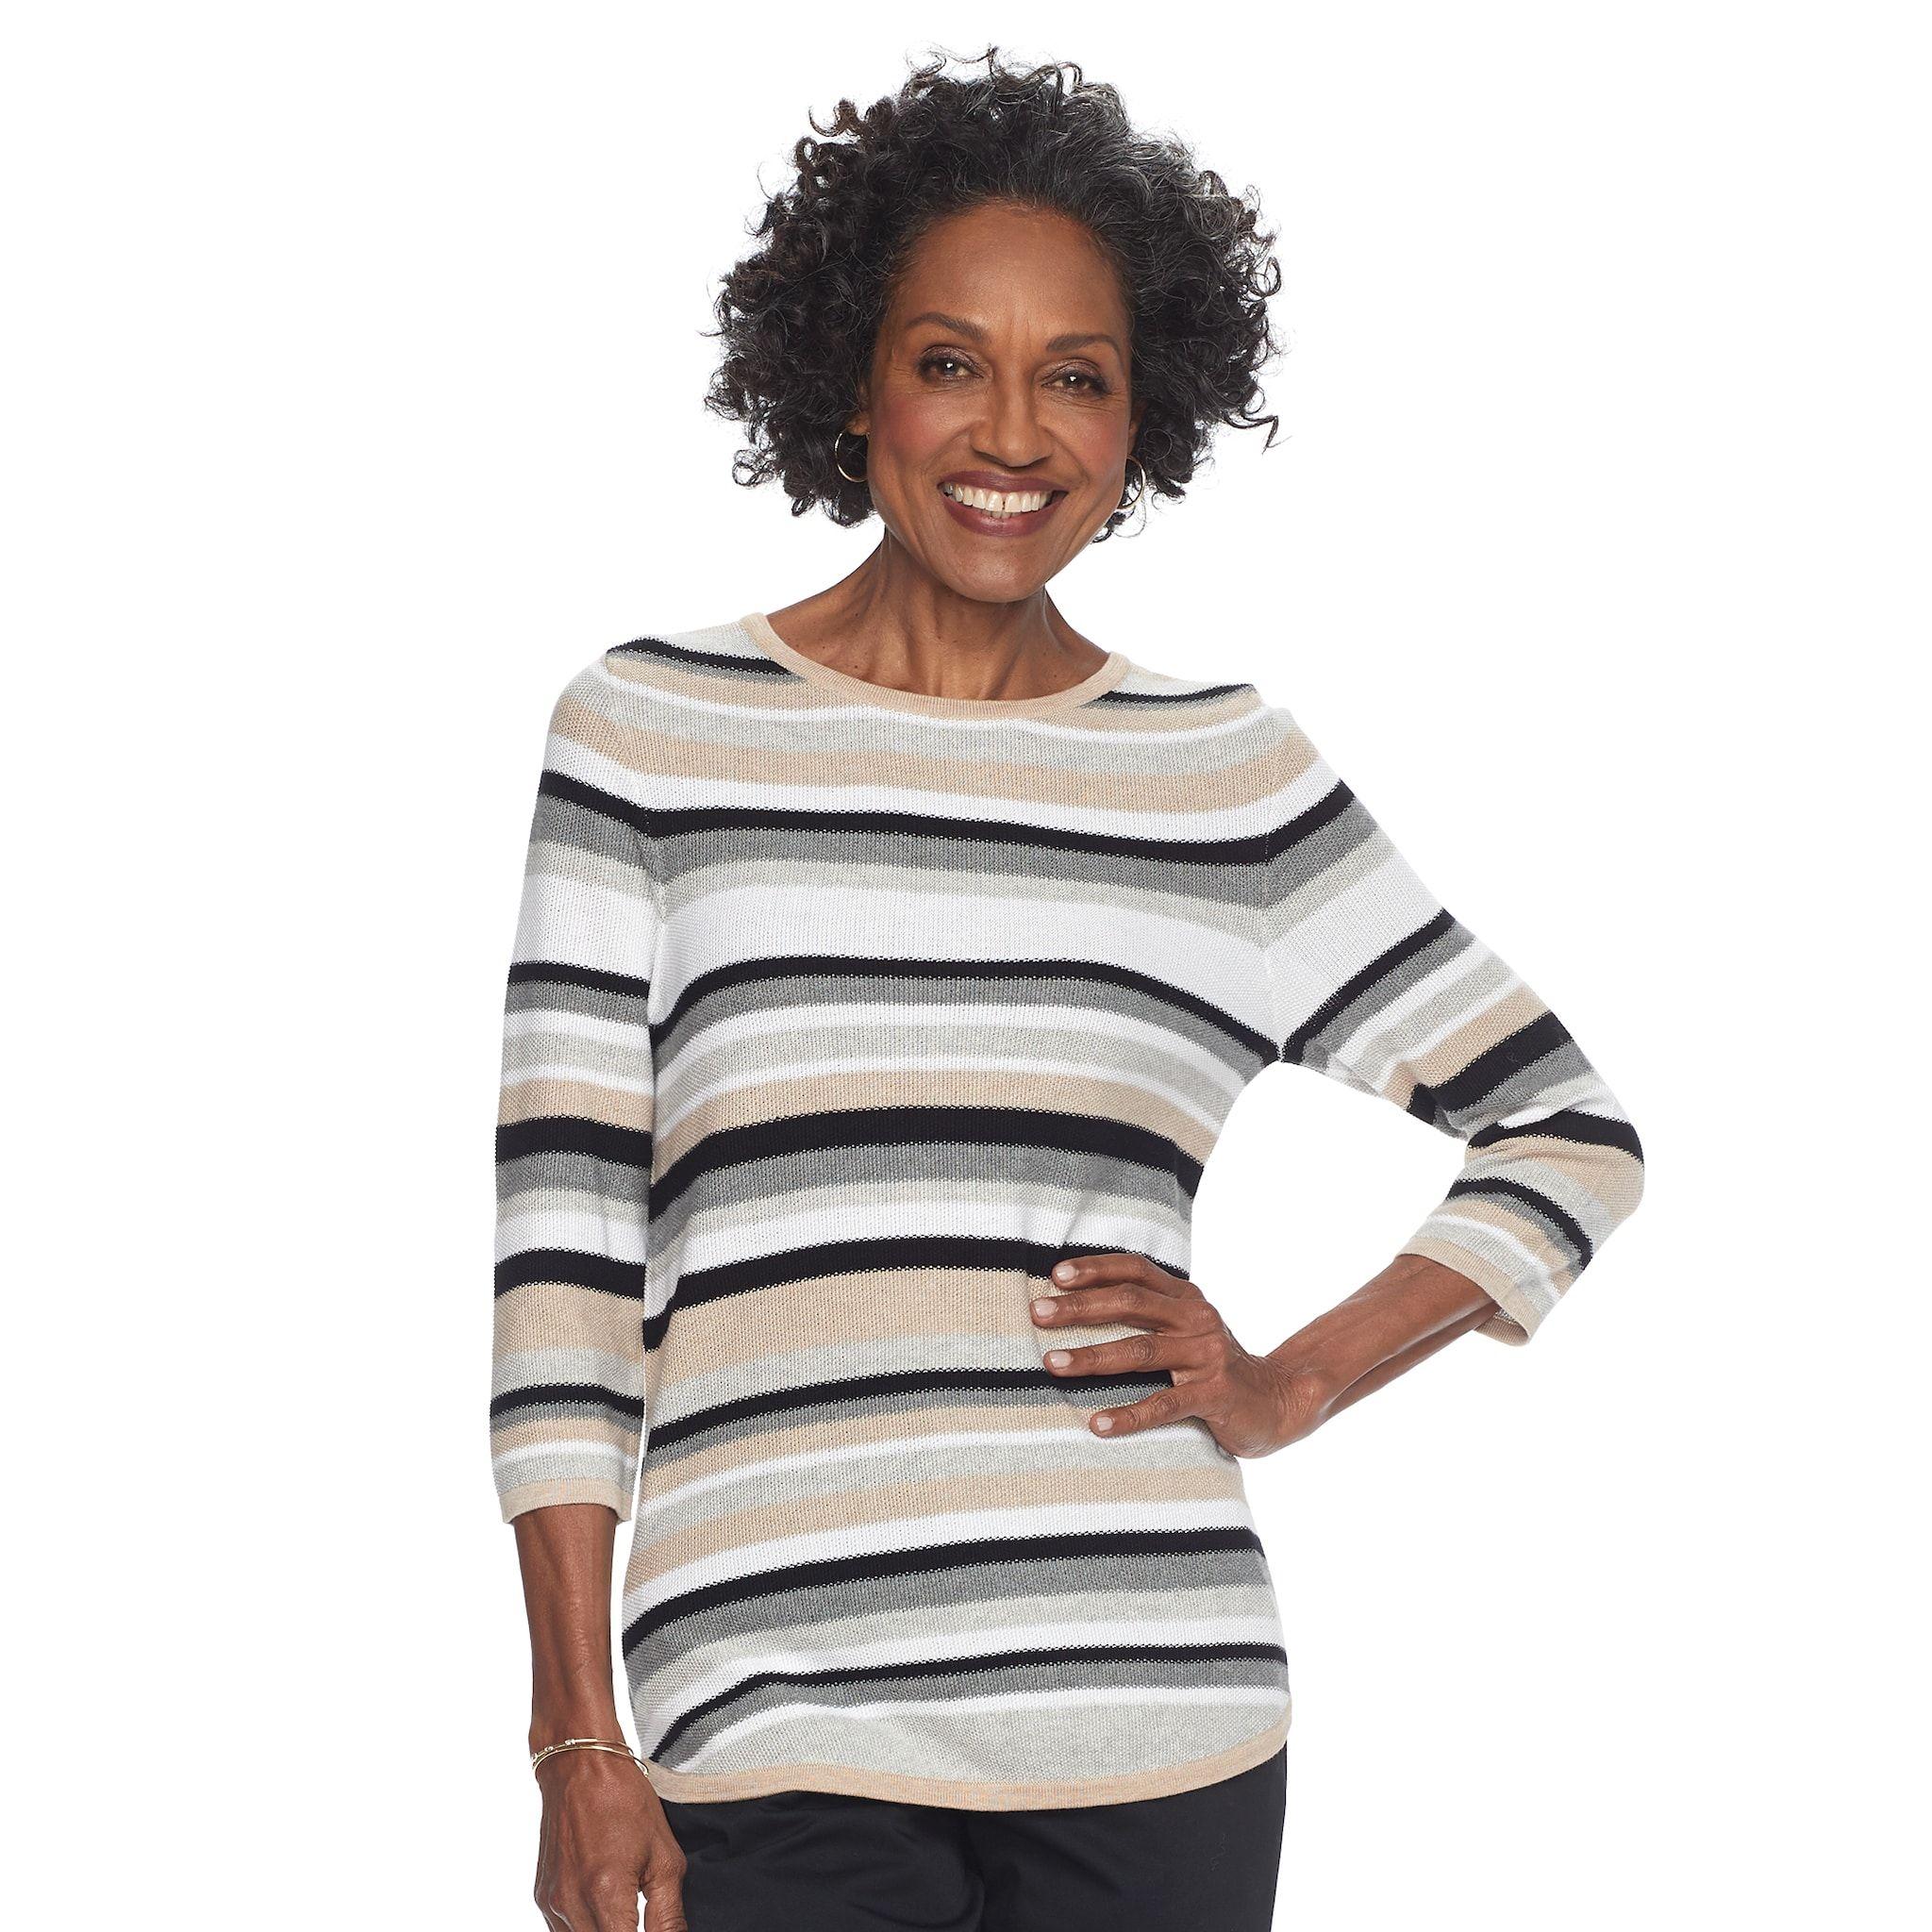 Women S Croft Barrow Striped Crewneck Sweater Crew Neck Sweater Women Sweaters [ 2048 x 2048 Pixel ]